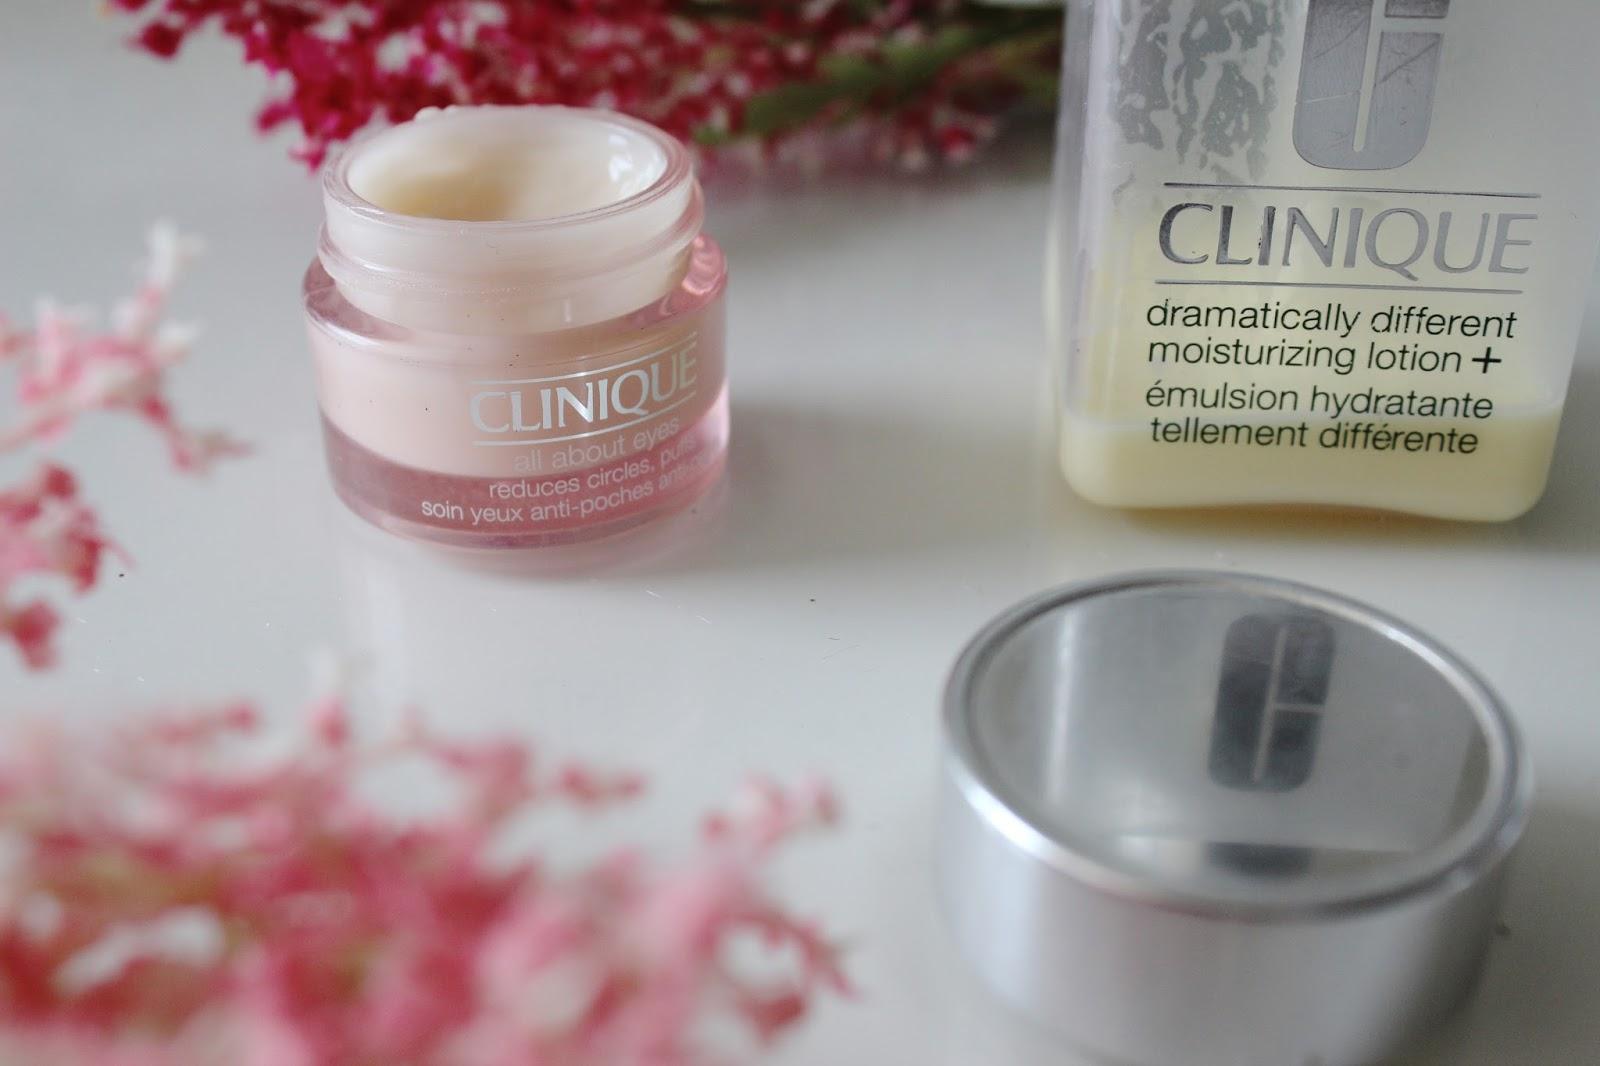 Daily skincare x Clinique